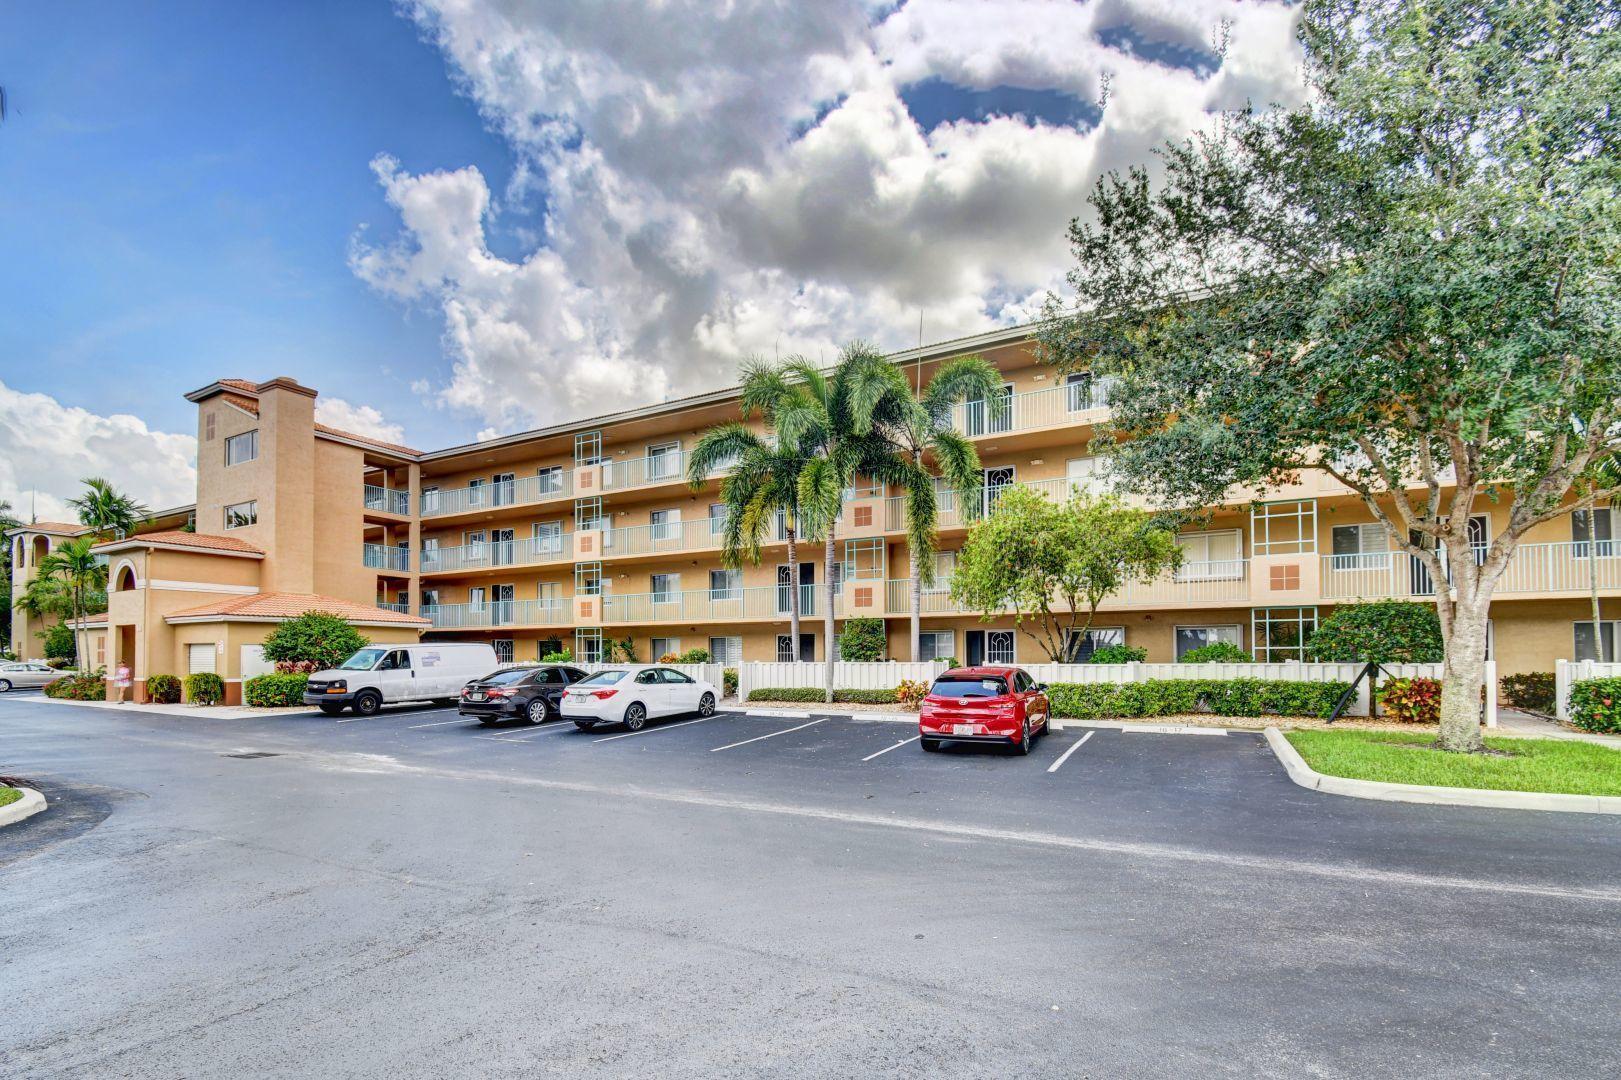 12560 Majesty Circle 407 Boynton Beach, FL 33437